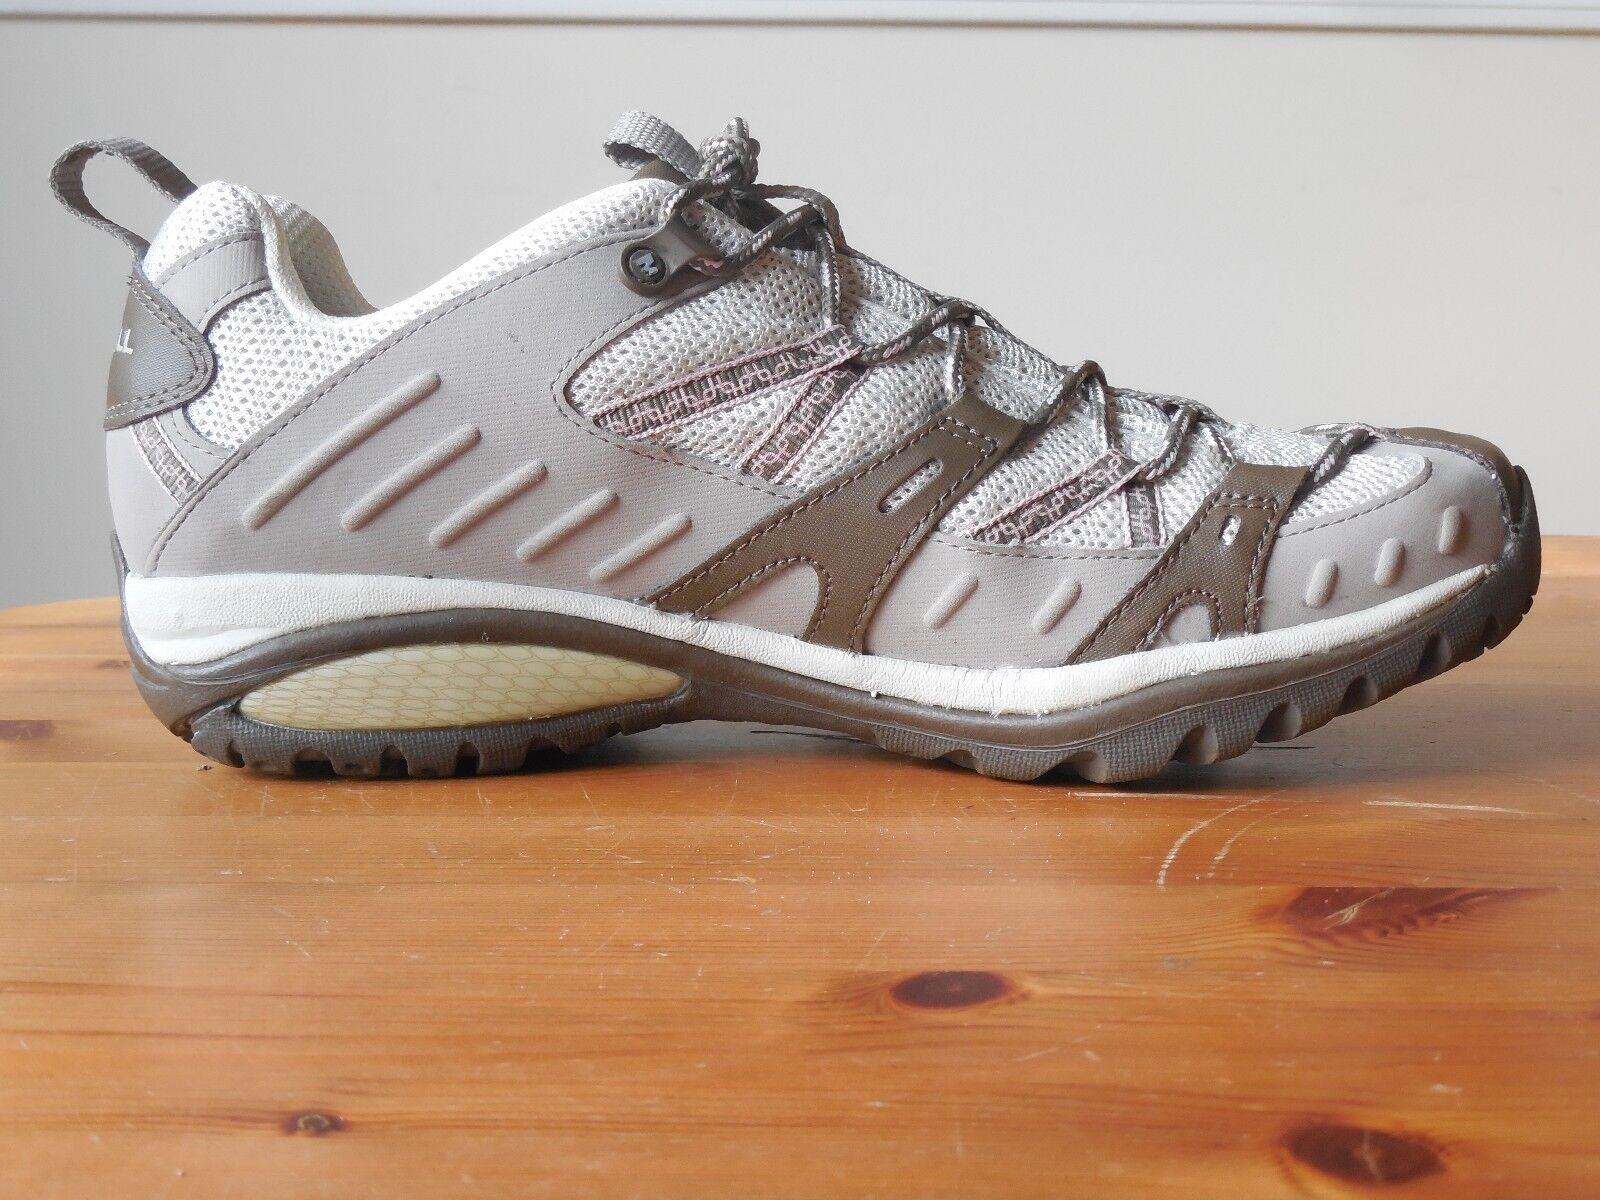 Zapatos Merrell Sirena 2 Senderismo elefante para mujer J58282